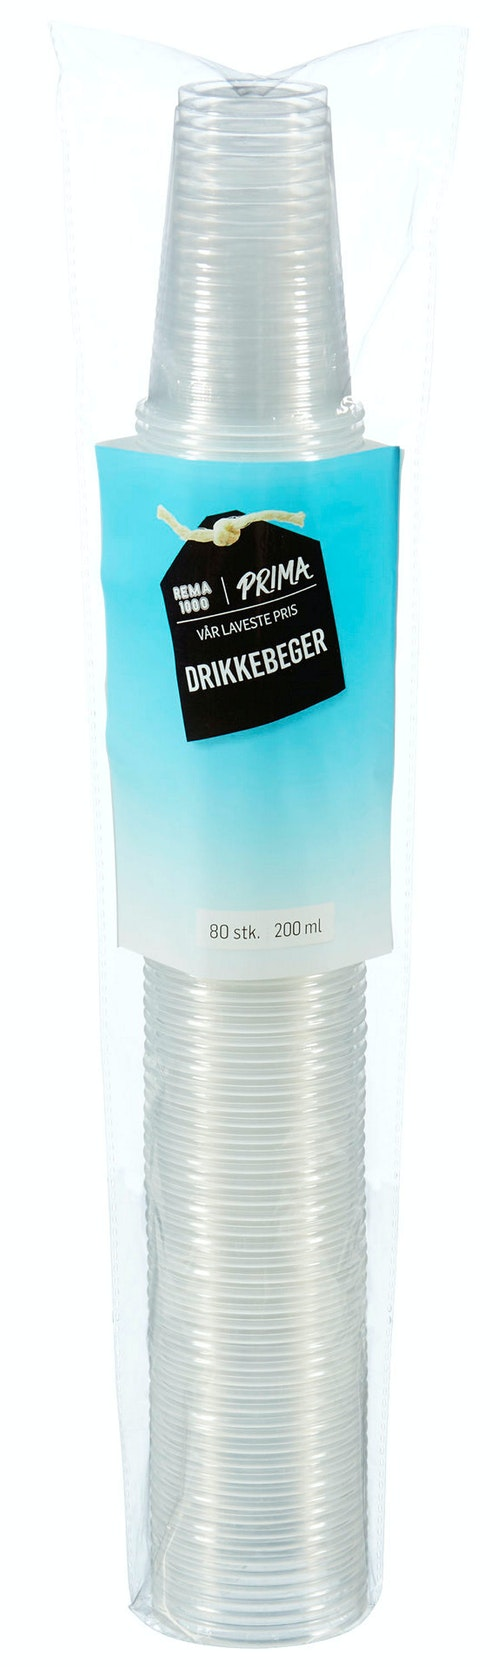 Prima Drikkebeger 200 ml, 80 stk